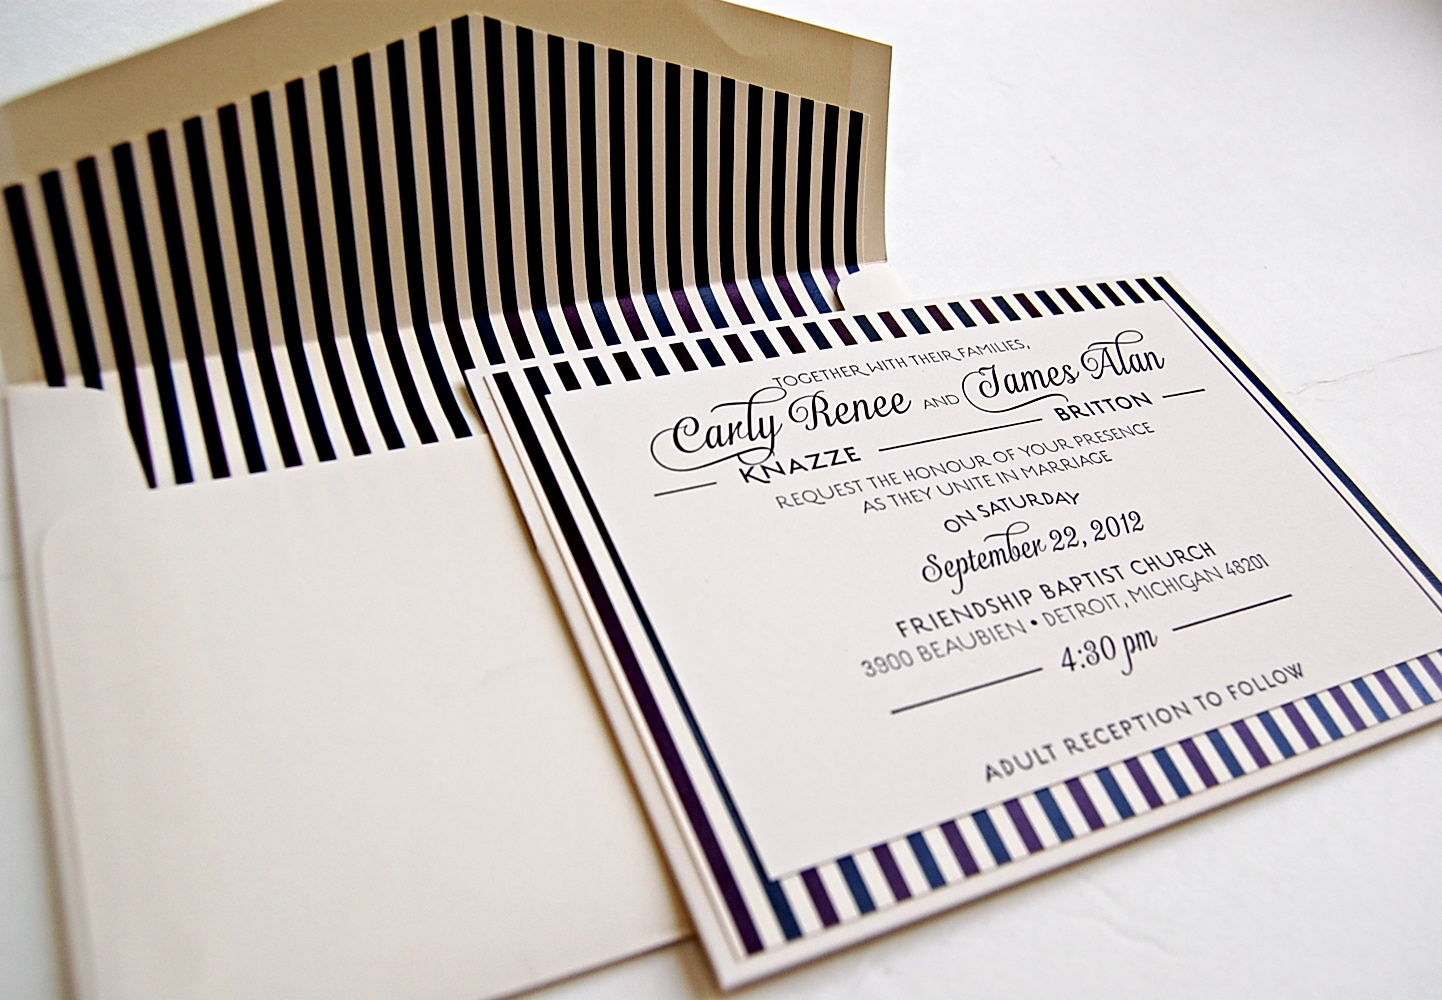 wedding invitation letterpress cost cost of wedding invitations Modern Letterpress Wedding Invitations